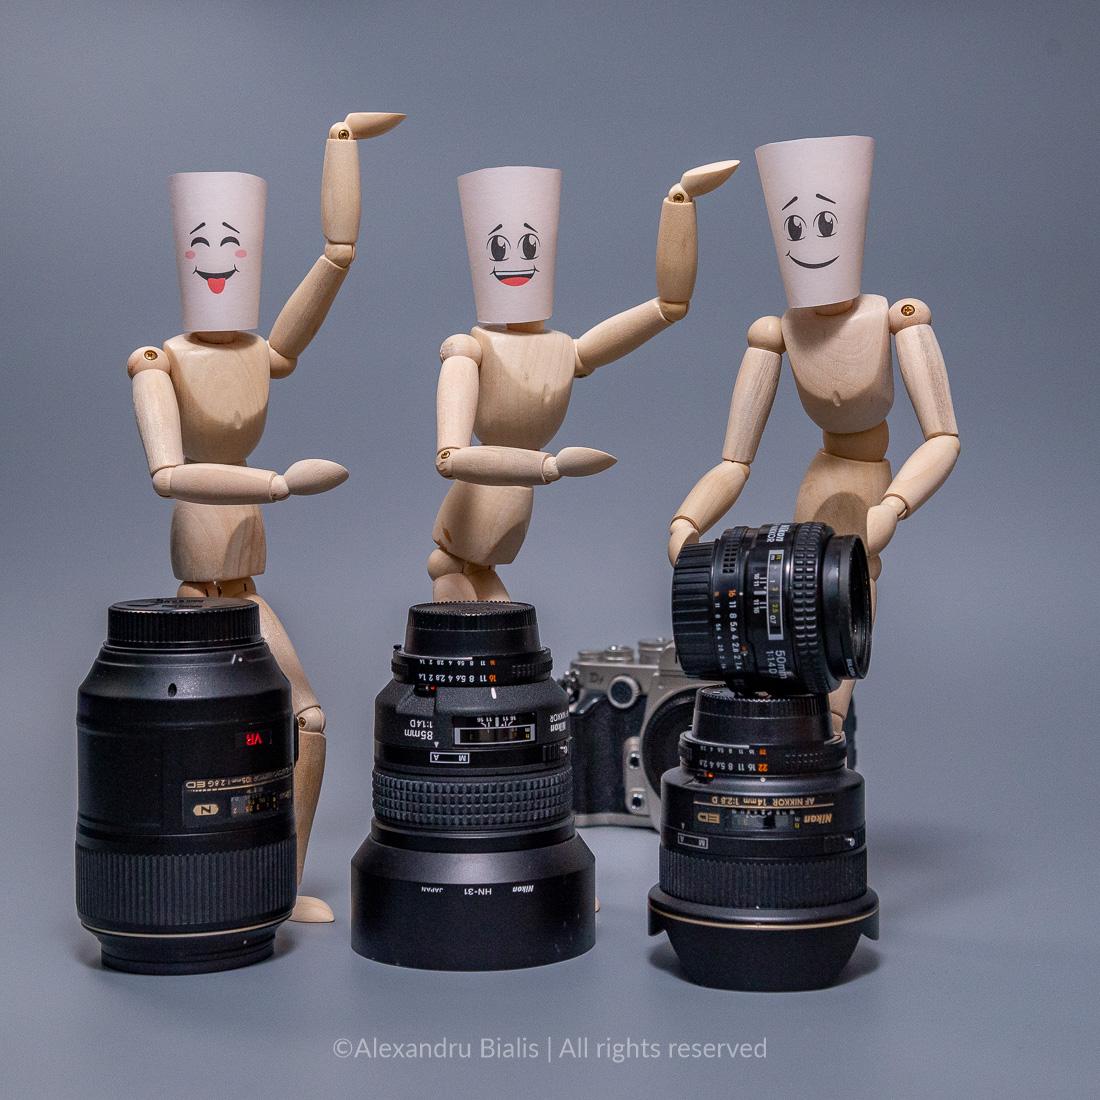 Curs foto online live interactiv, Editare foto Adobe Lightroom